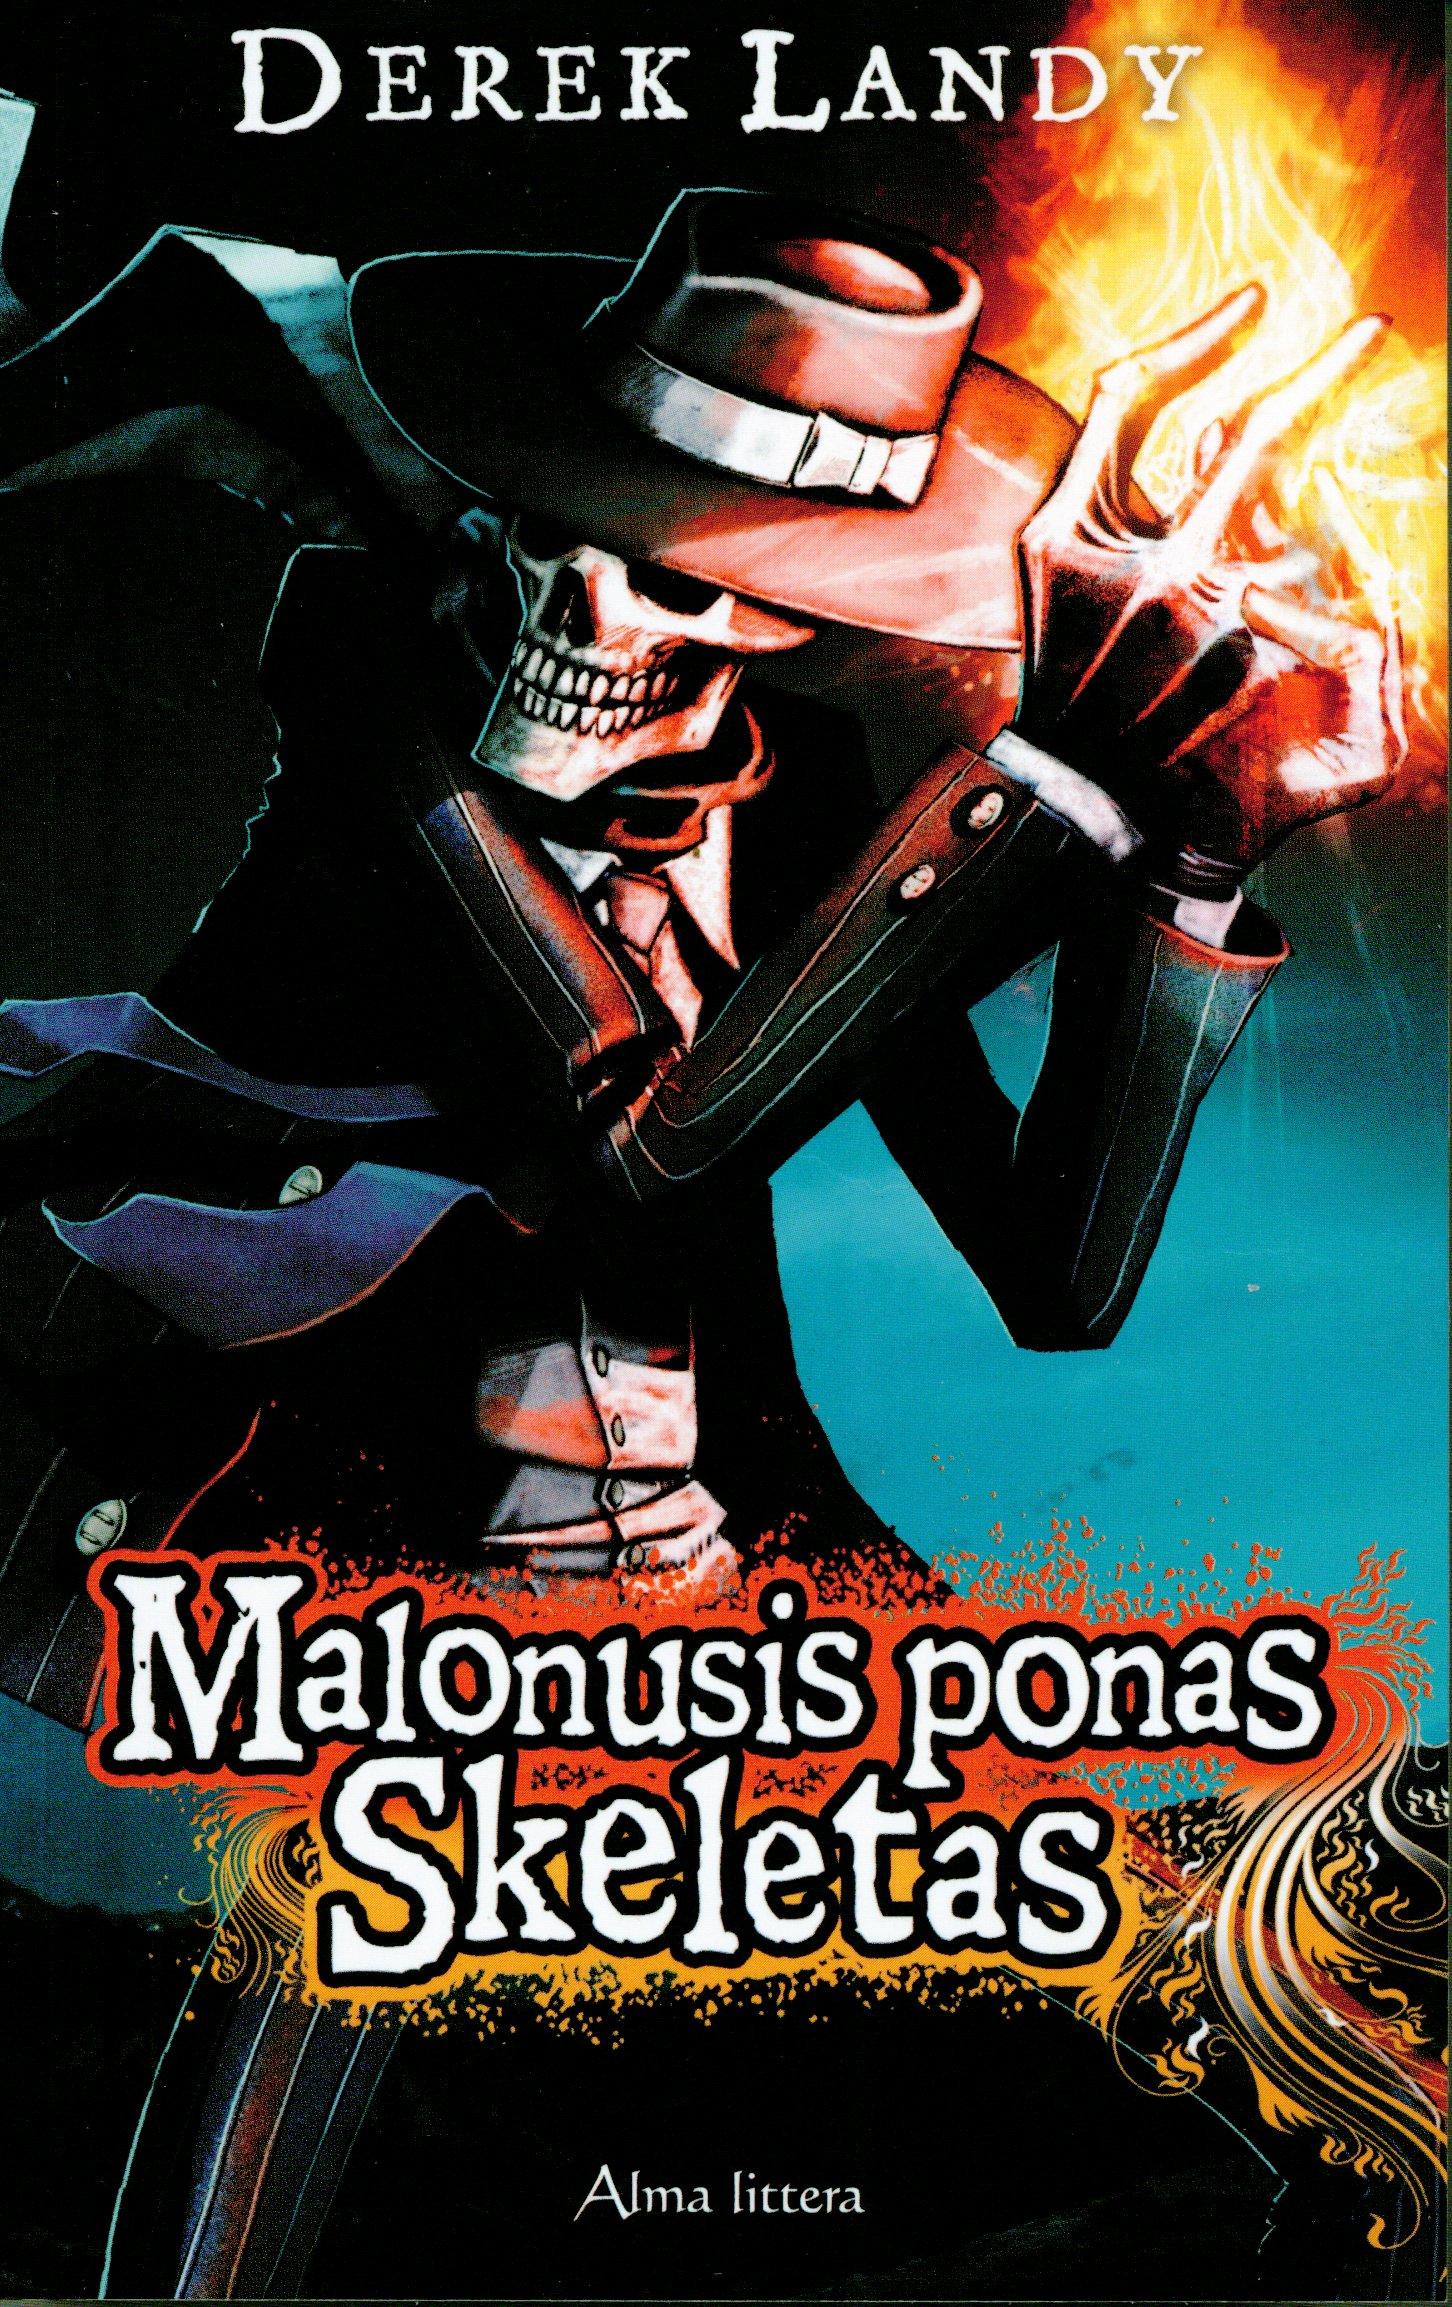 "Derek Landy ""Malonusis ponas skeletas"""